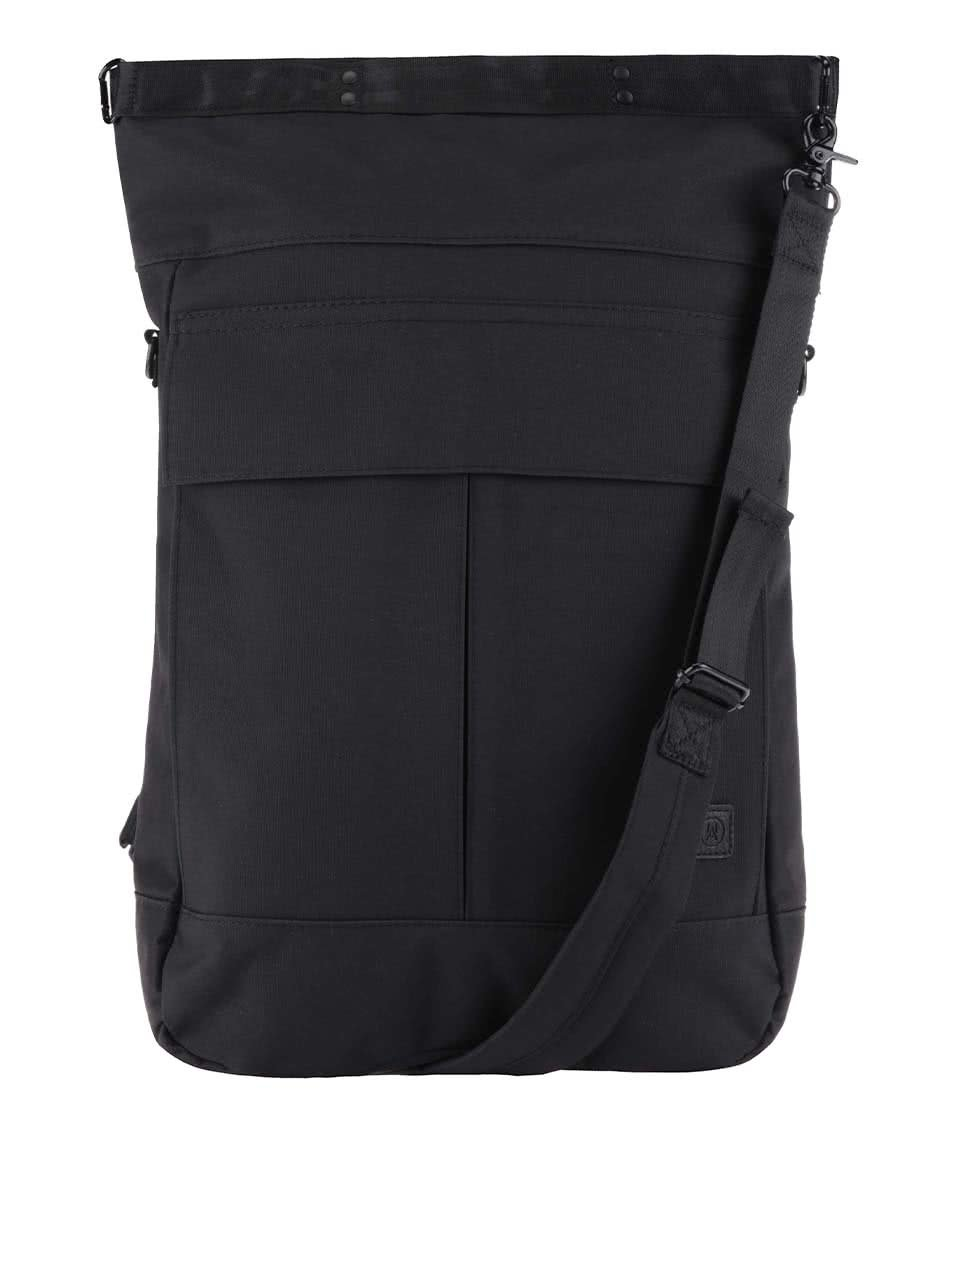 Černý batoh / taška přes rameno Ucon Declan Waterproof 18 l